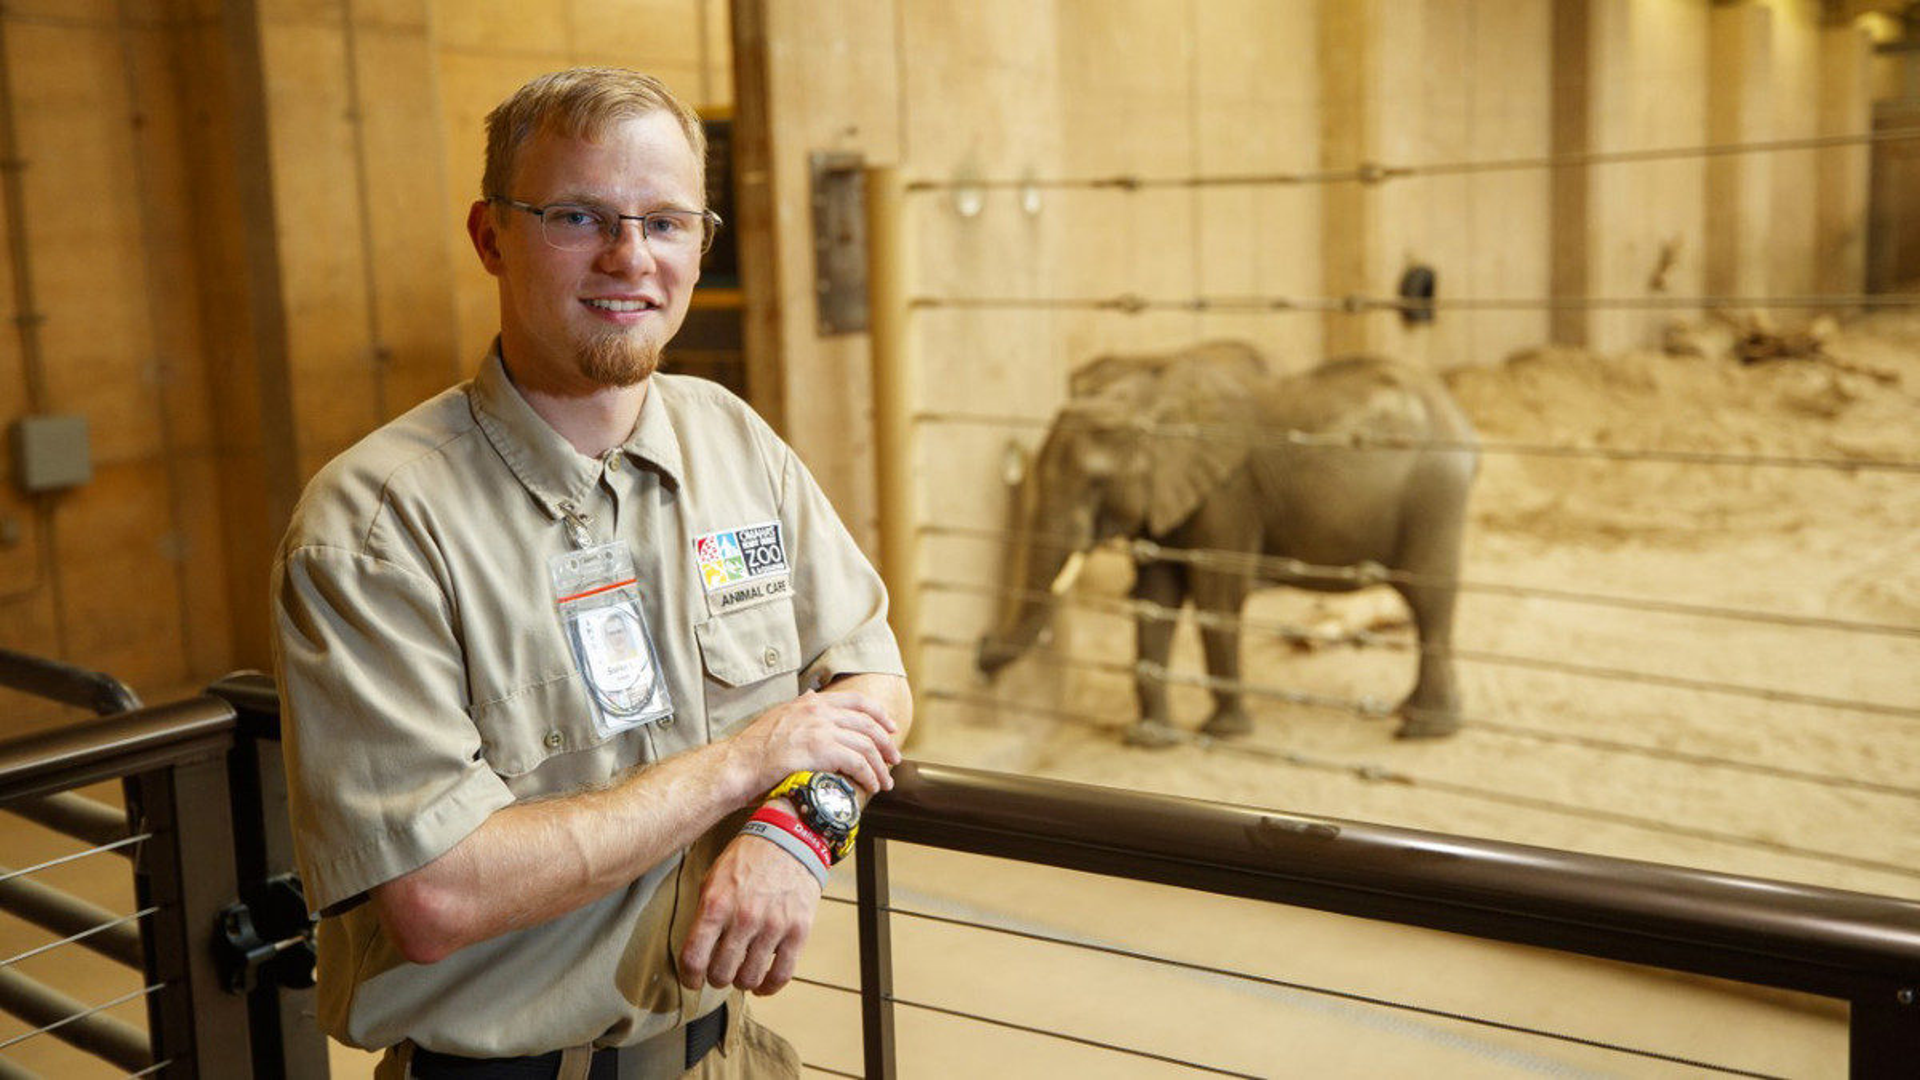 Nebraska experience propels Lechnowsky's elephant, conservation focus